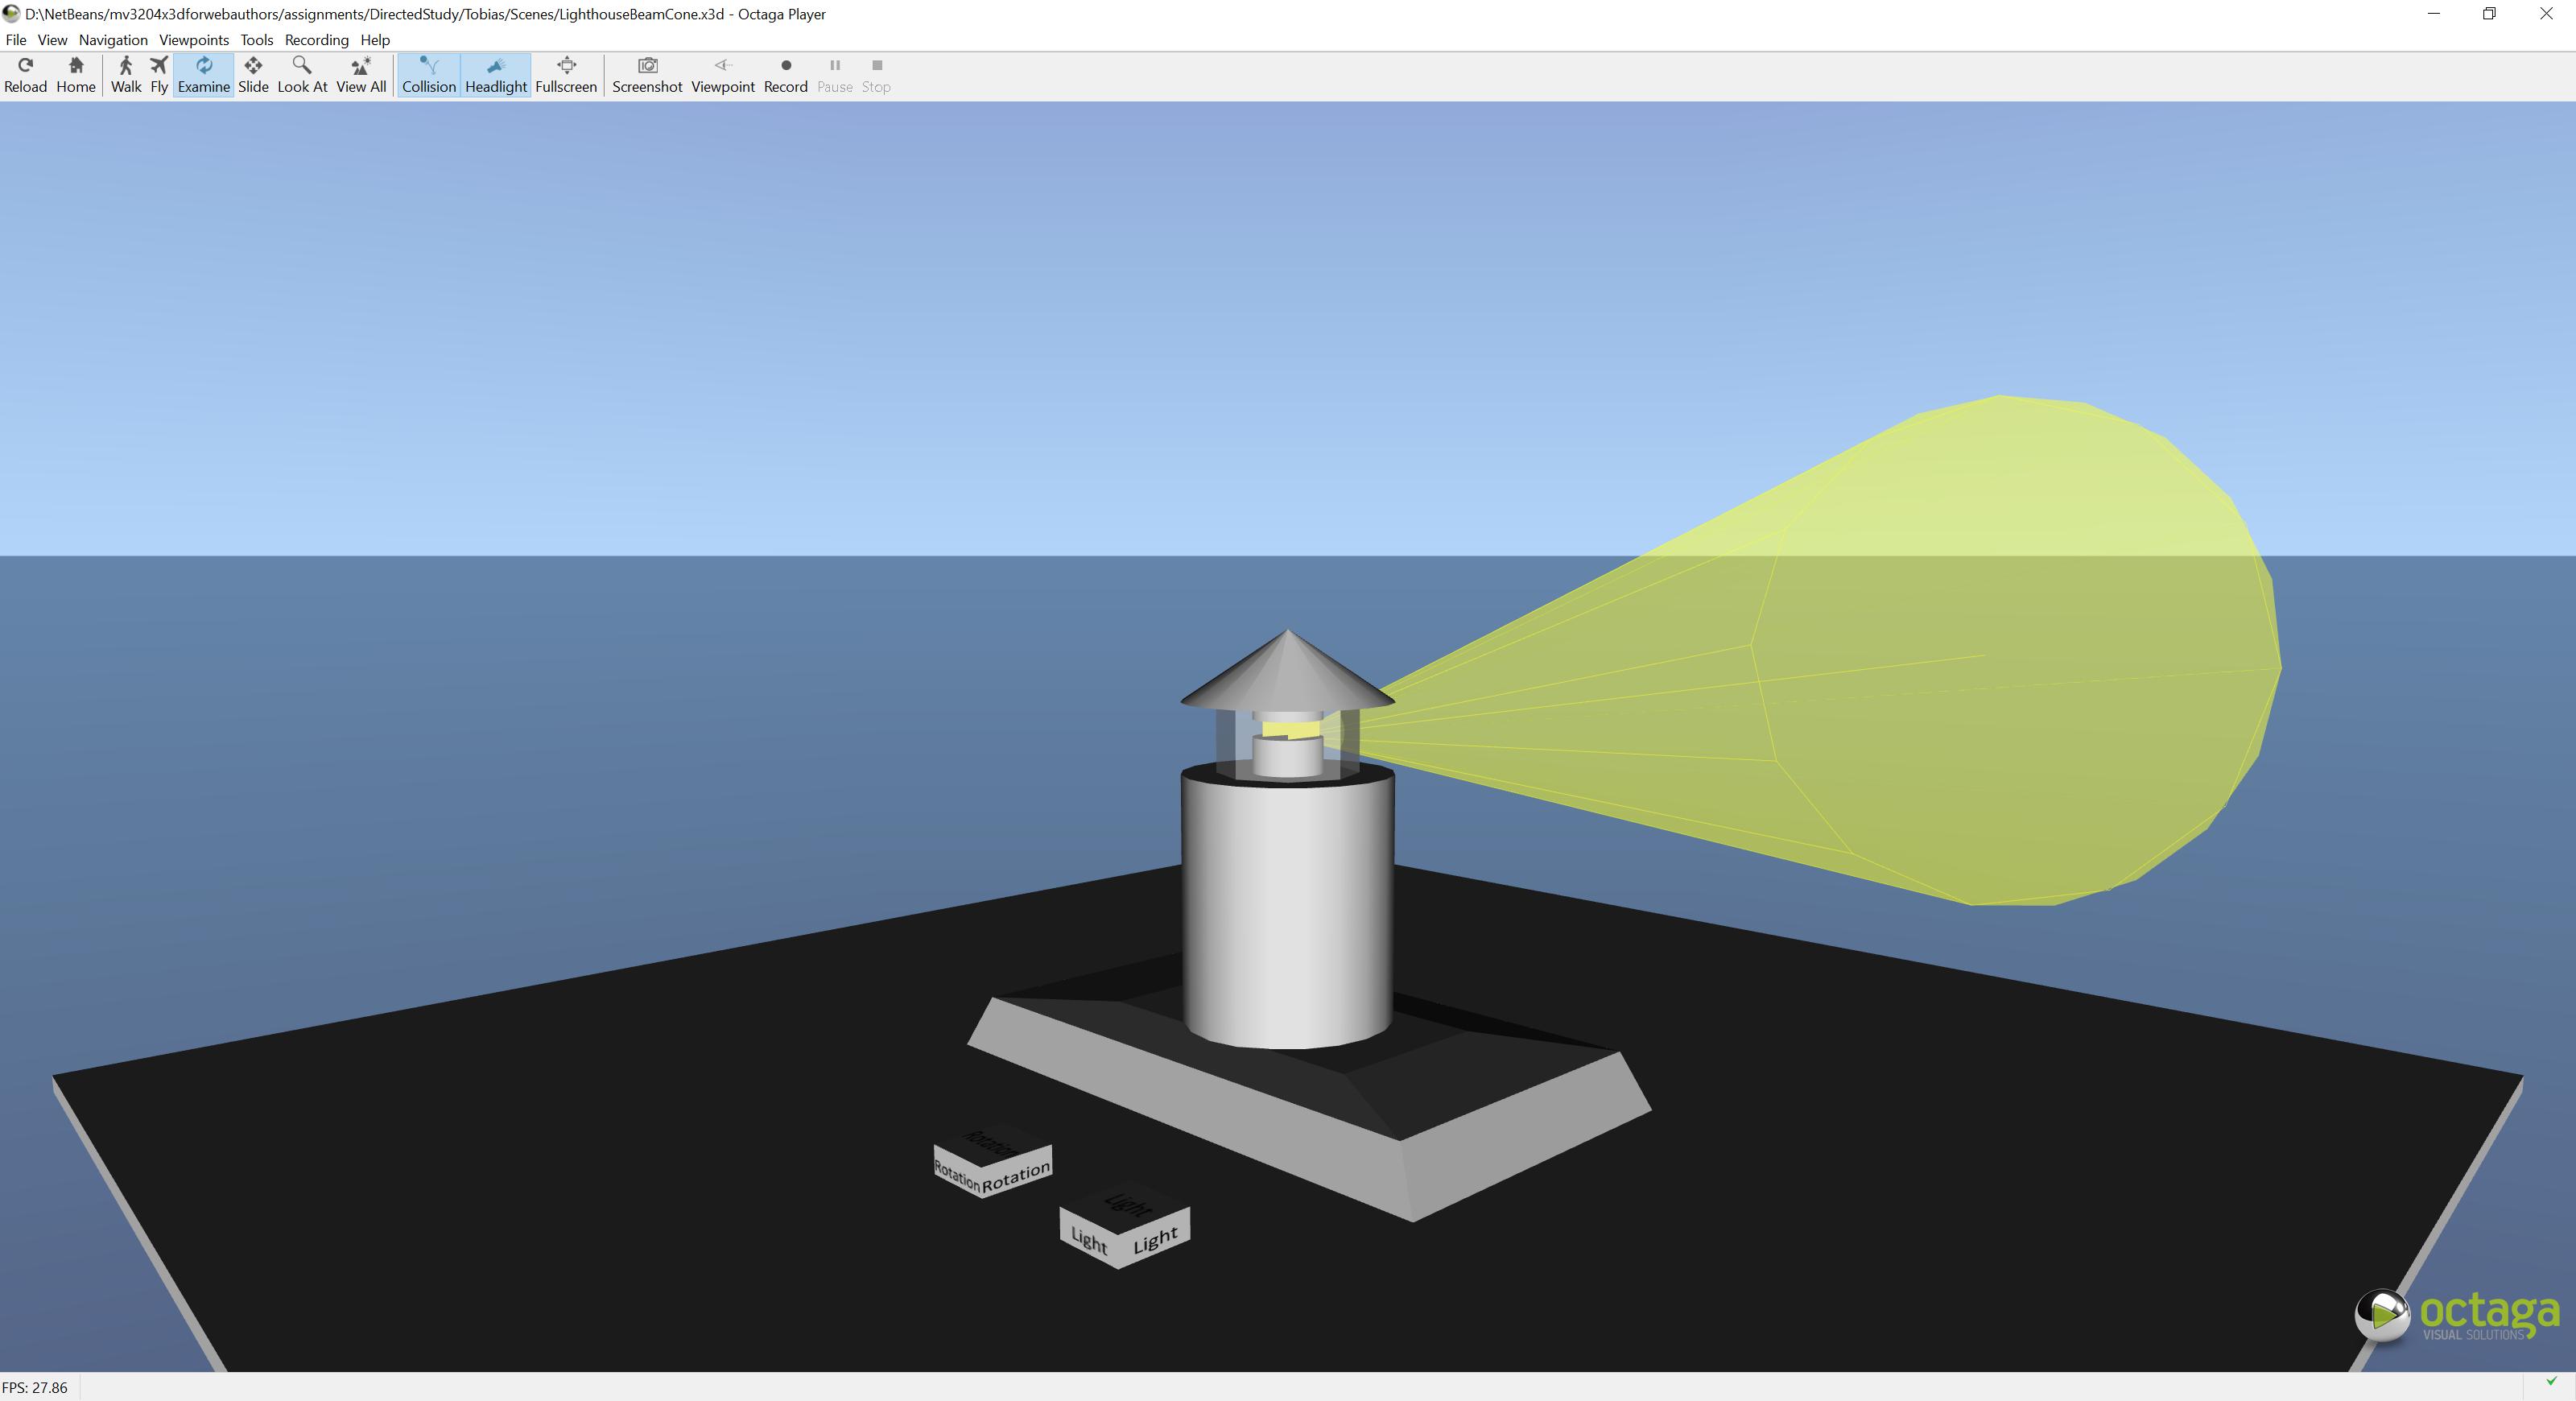 BrennenstuhlTobias/Screenshots/Player/Lighthouse/LightHouse.Octaga.png